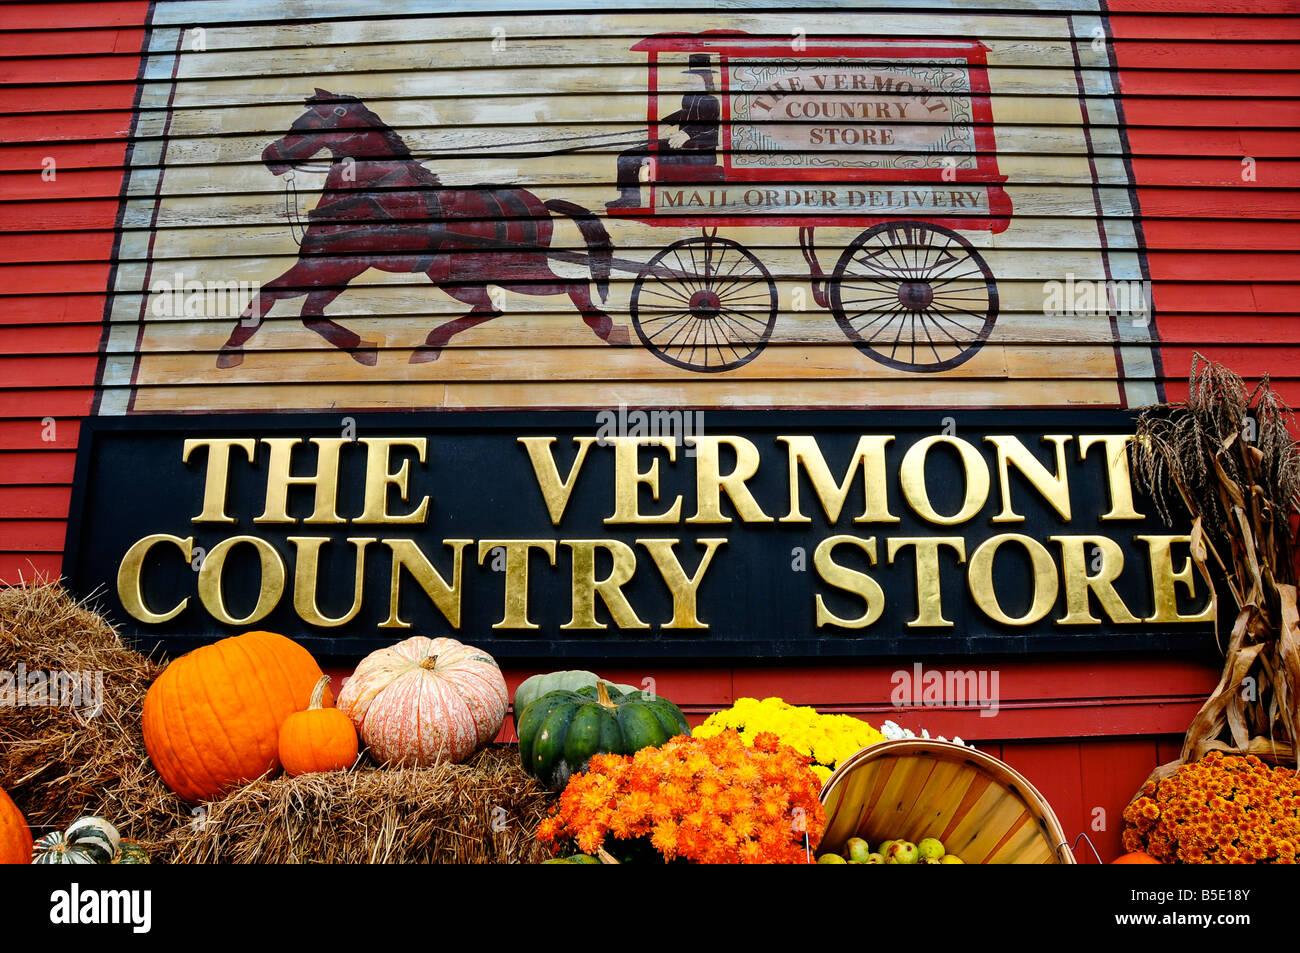 The Vermont Country Store, Weston, Vermont, USA Stock Photo